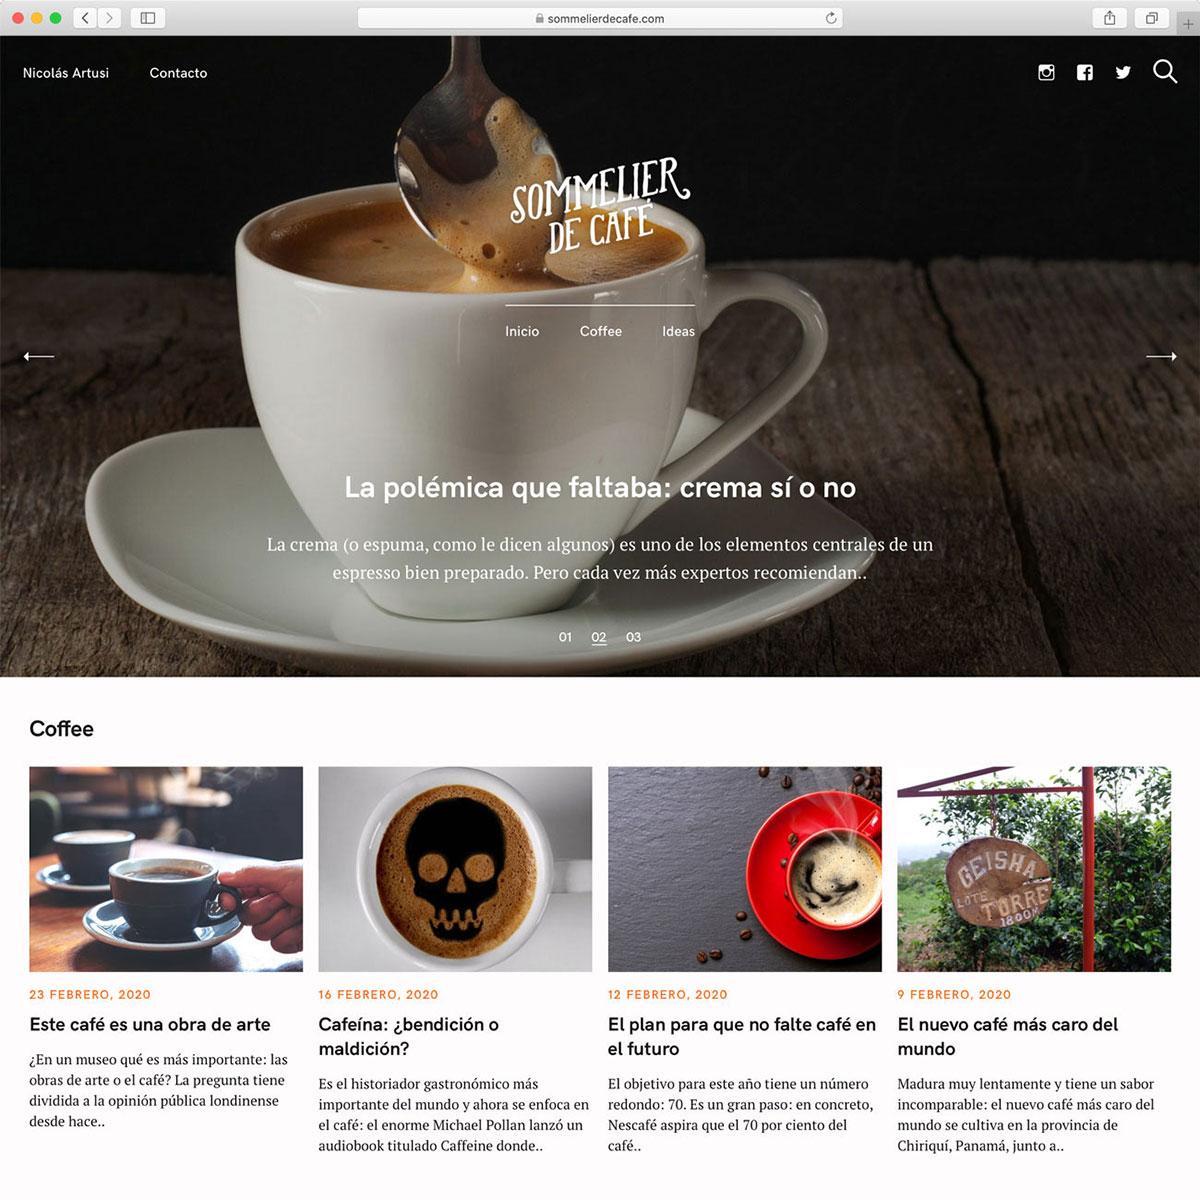 kucha-nicolas-artusi-sommelier-de-cafe-web-03